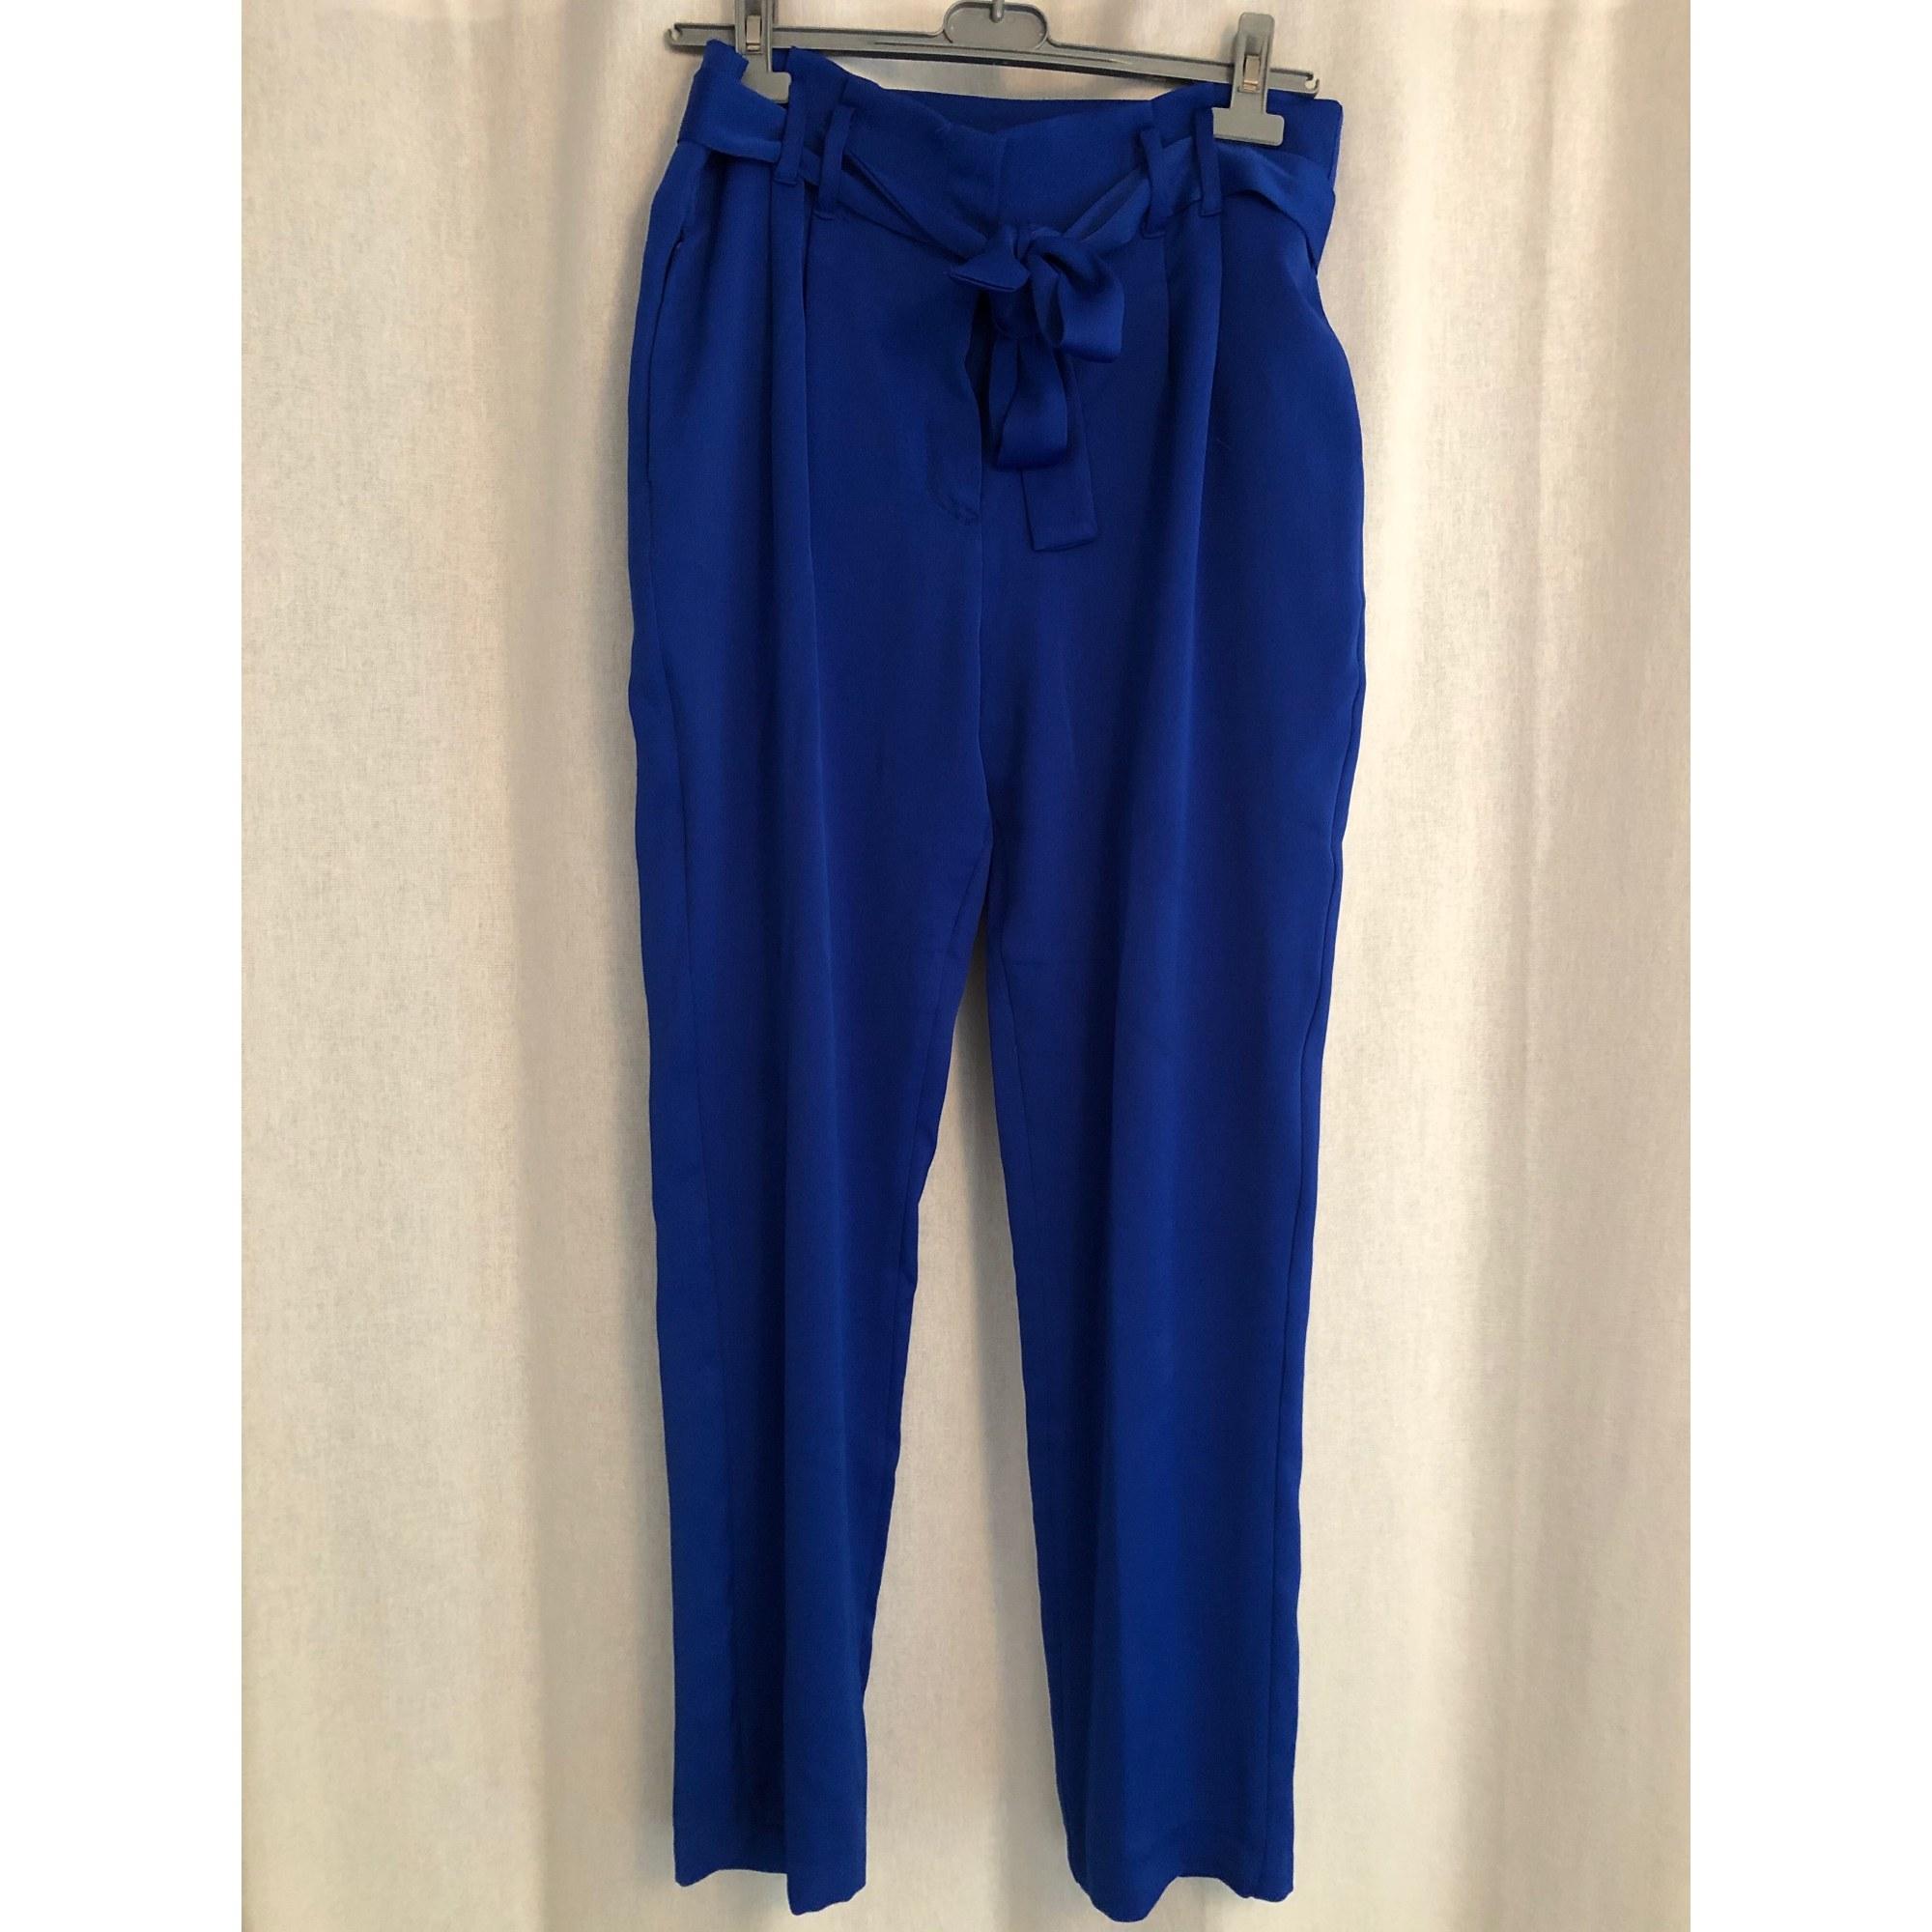 Pantalon carotte FORMULA JOVEN Bleu, bleu marine, bleu turquoise